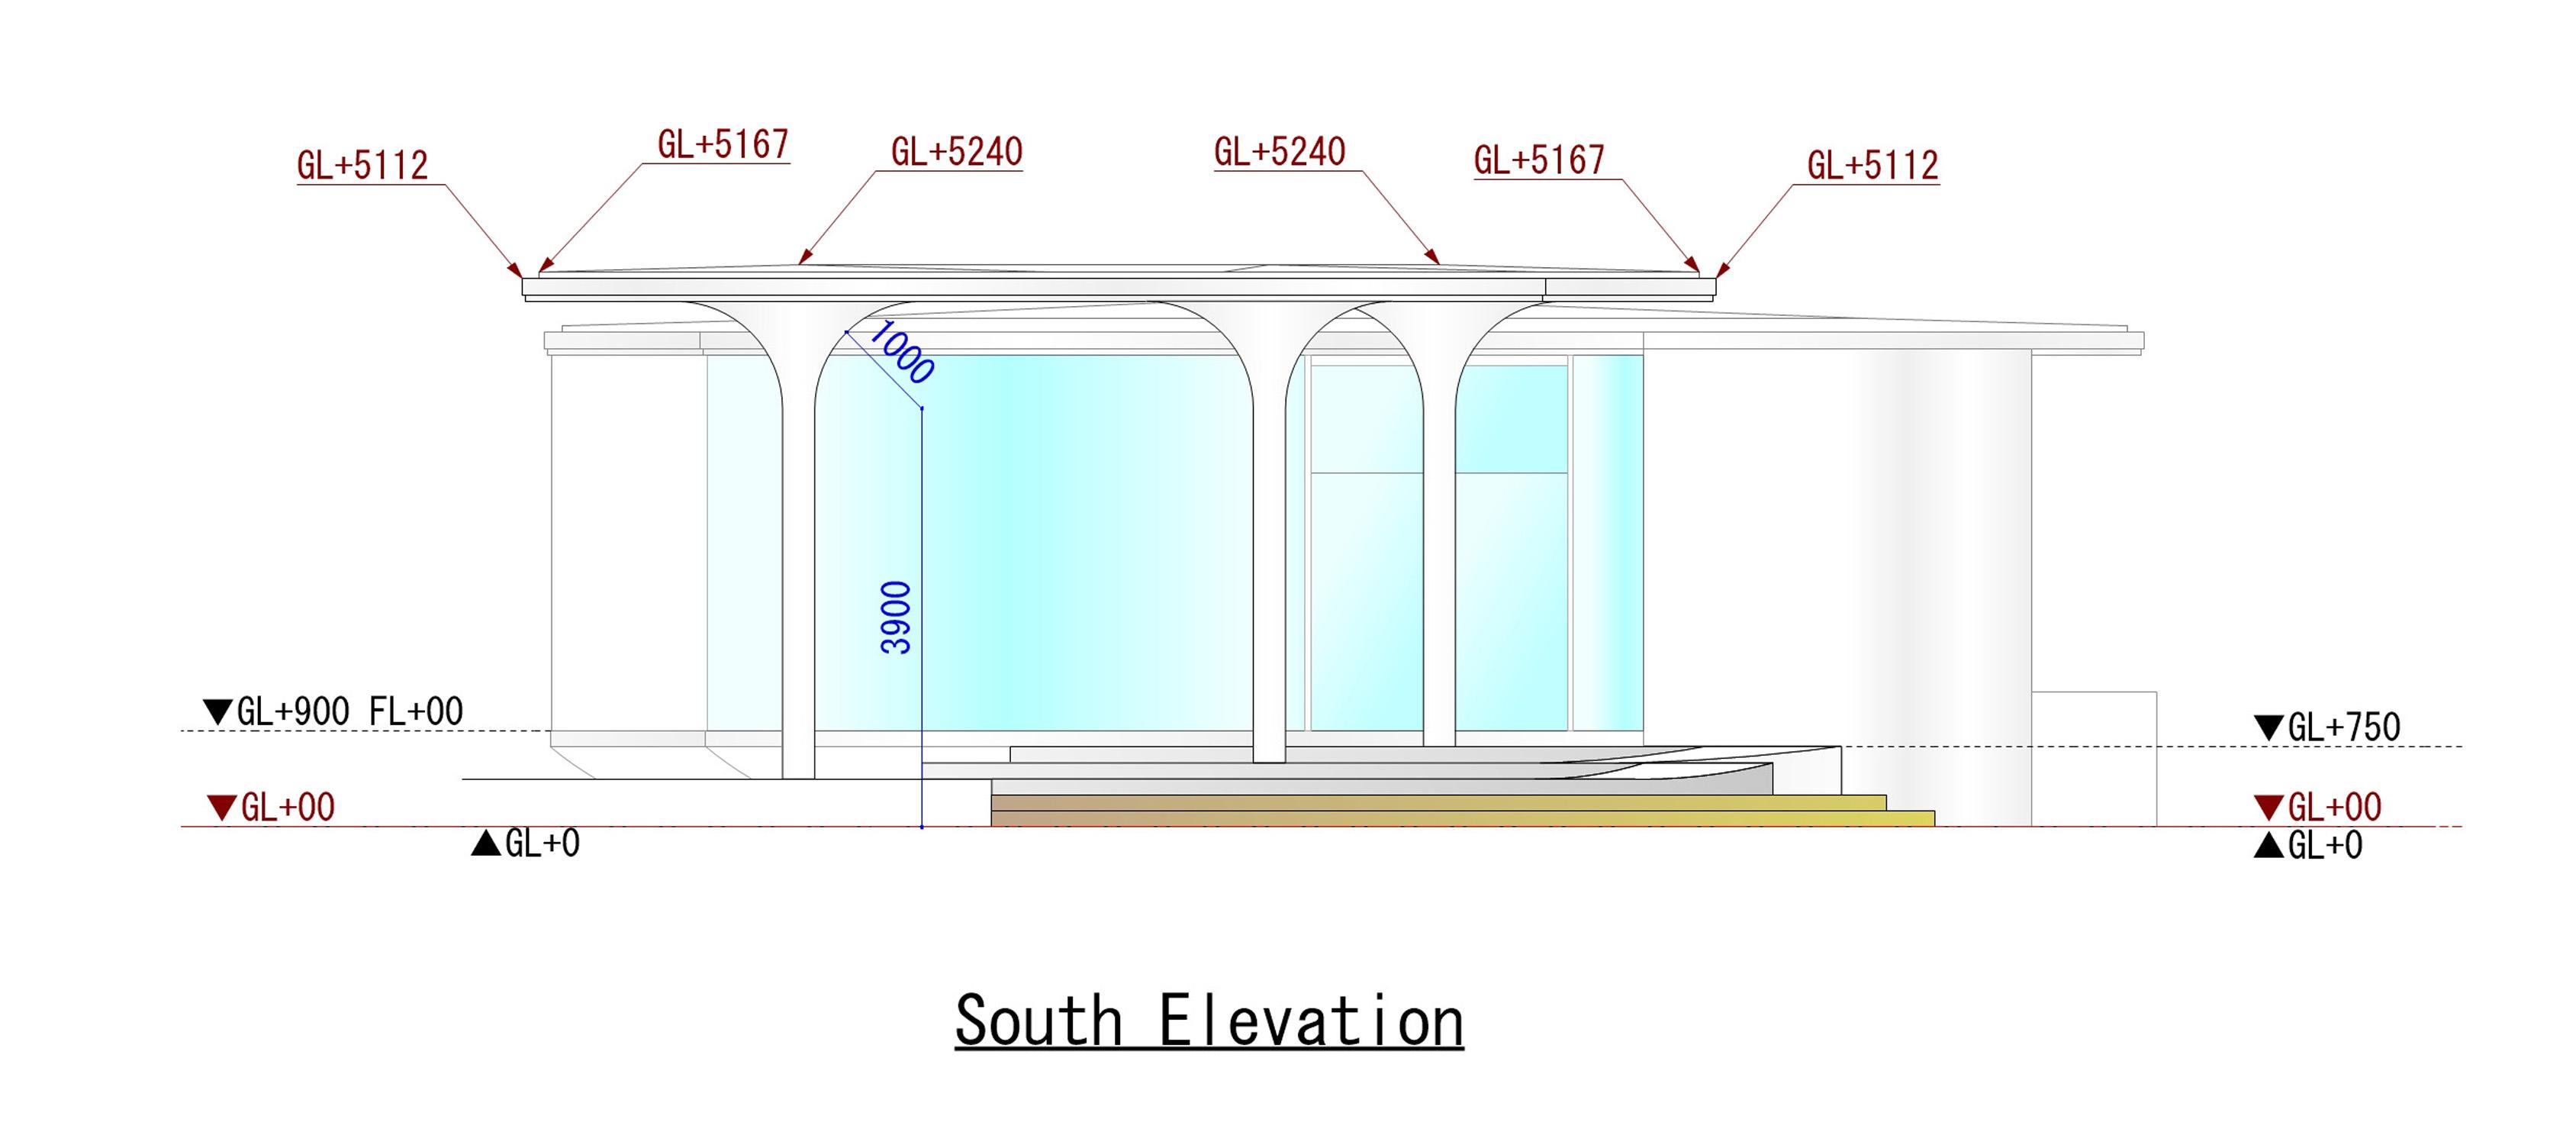 South Elevation KTX archiLAB}